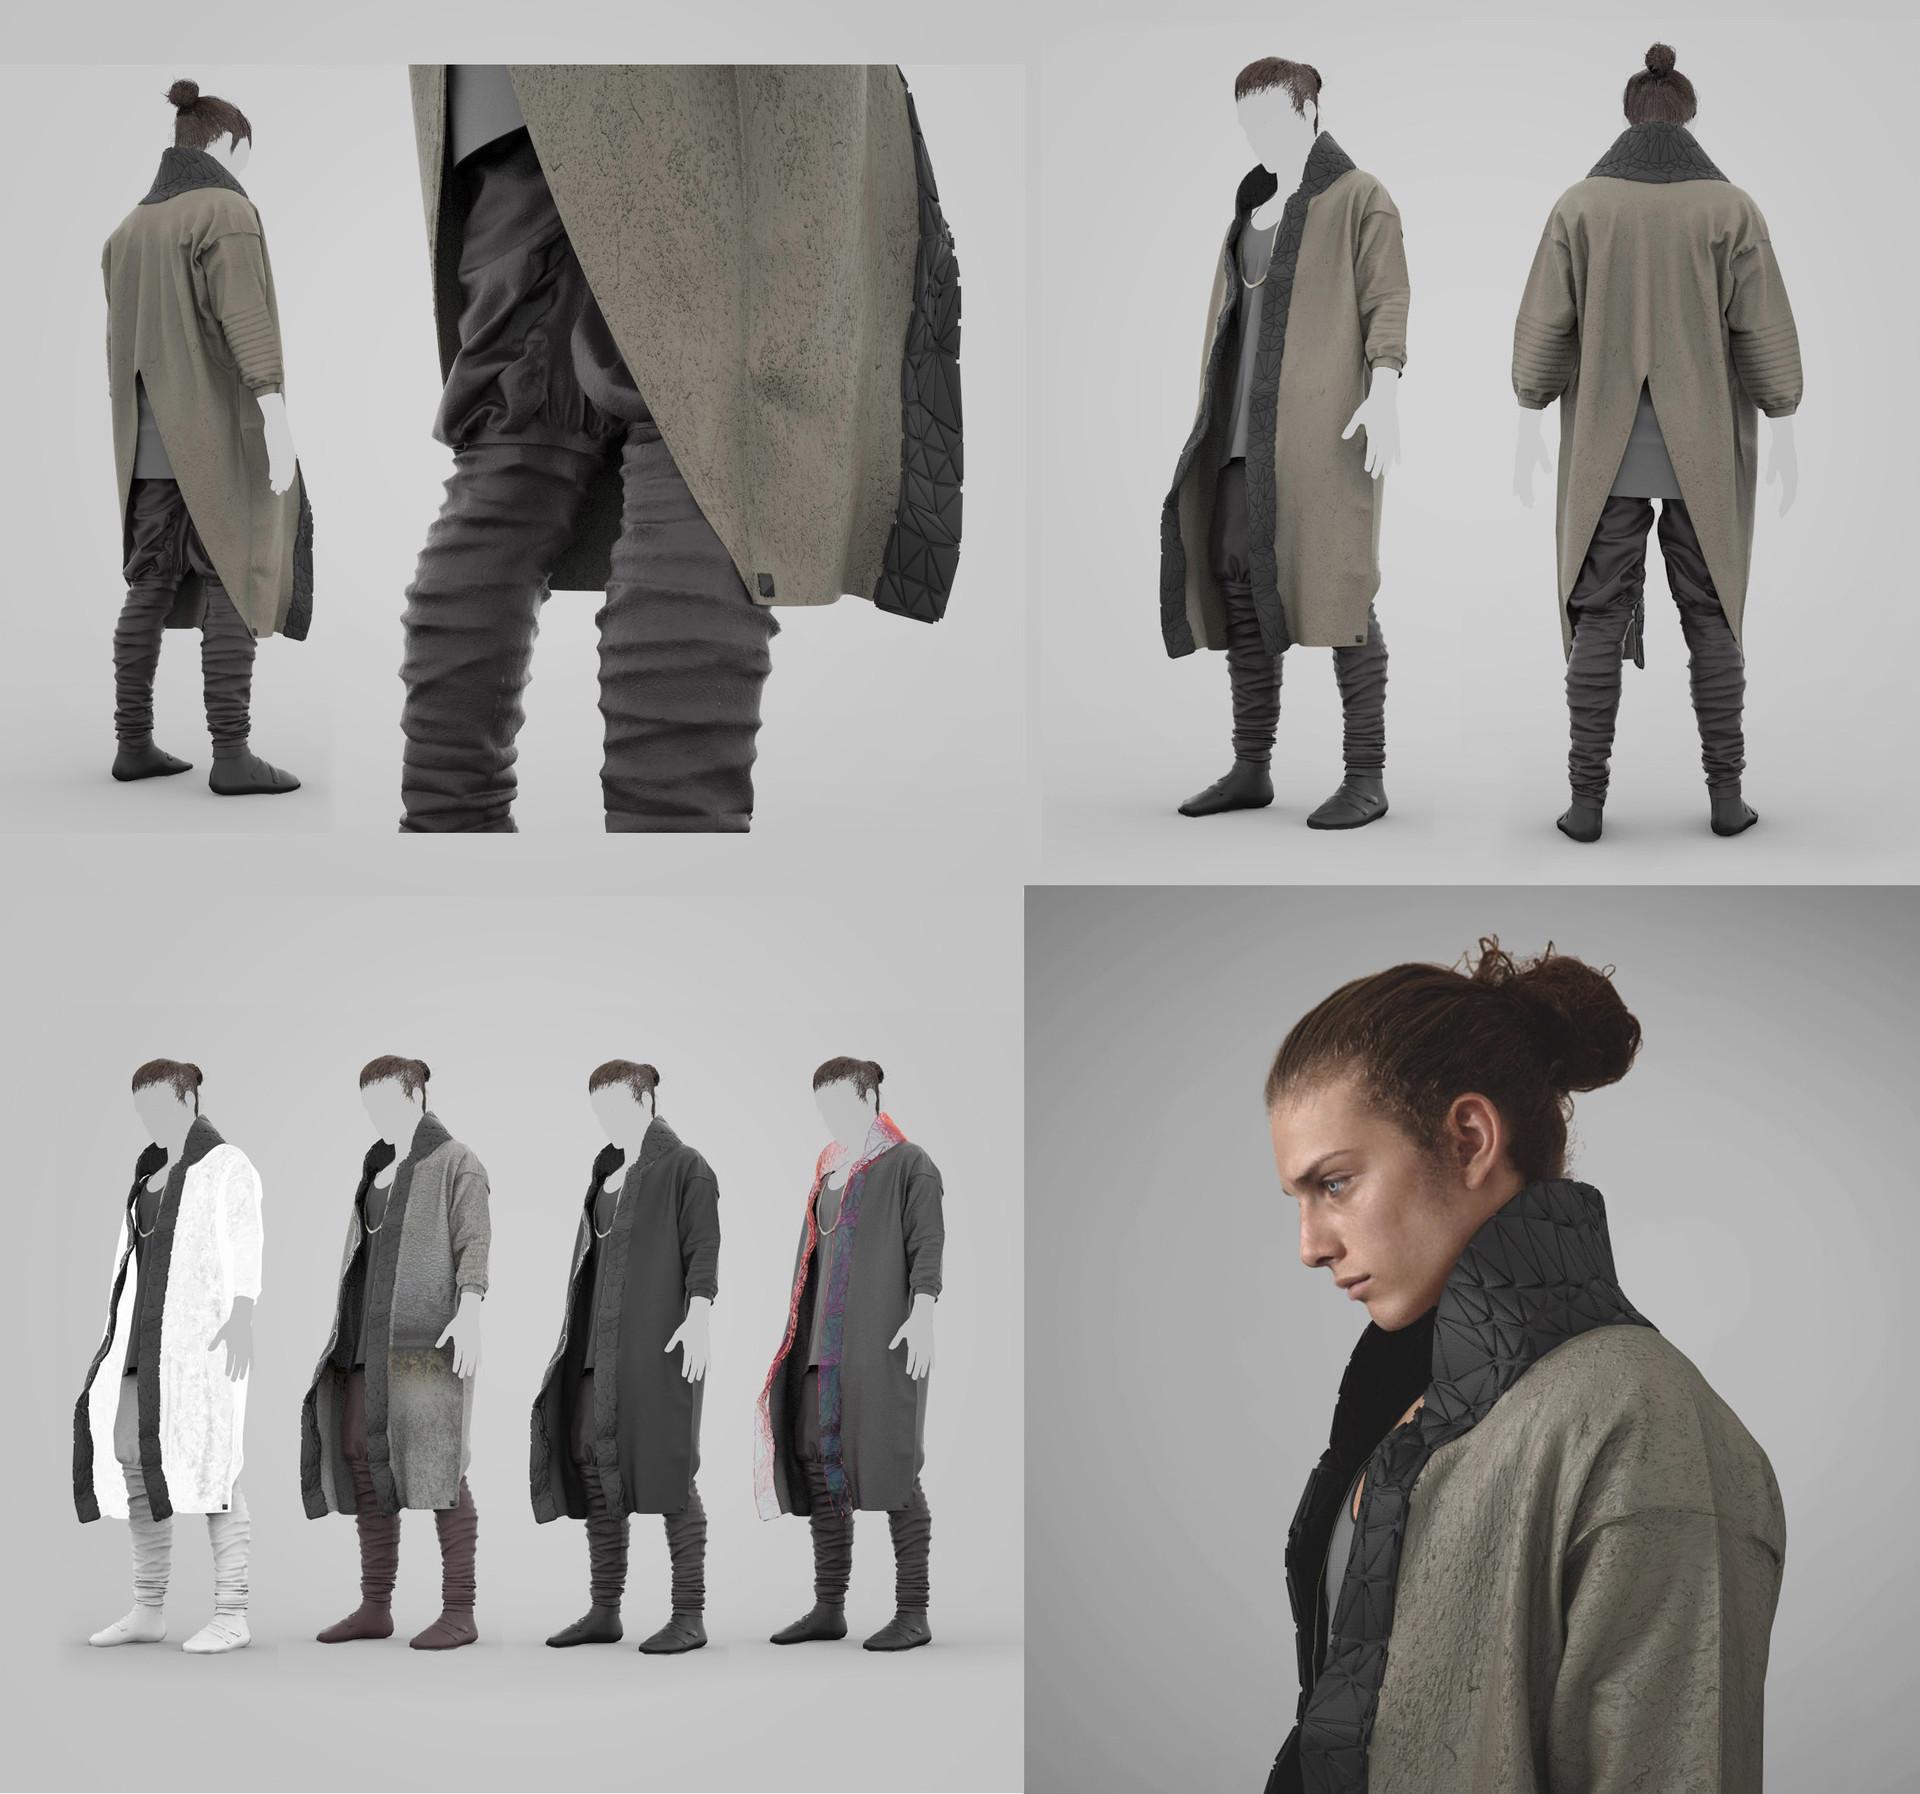 Travis davids jacketlook7